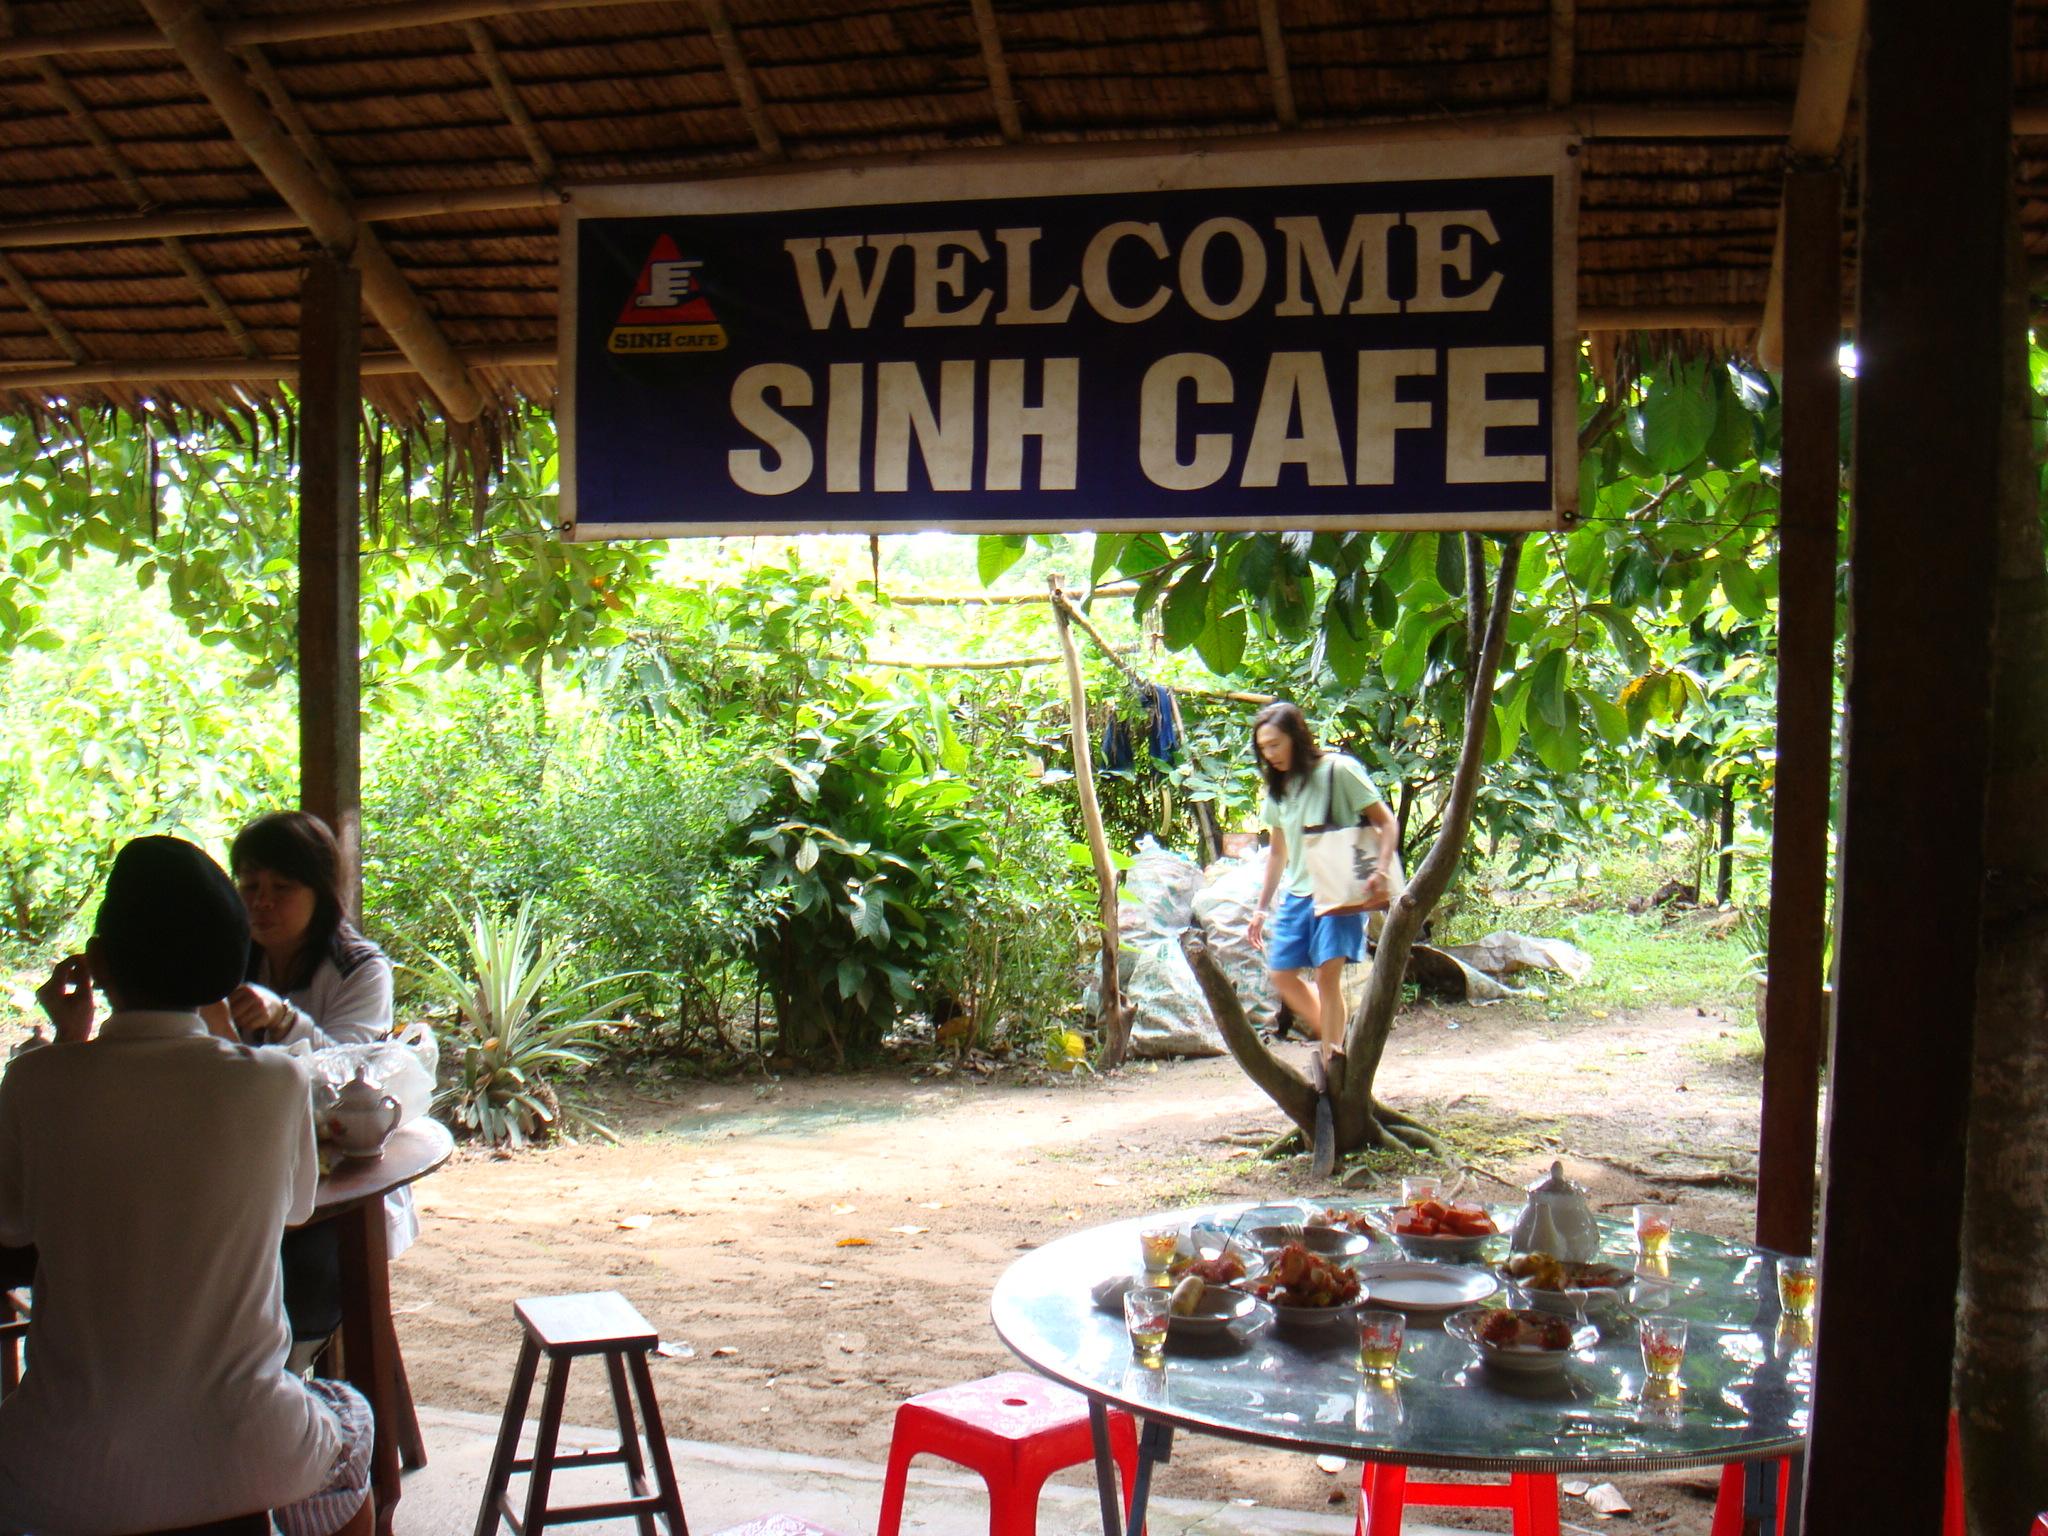 Sinhcafe - Vietnam Open Tour - TripAdvisor: Read Reviews ...